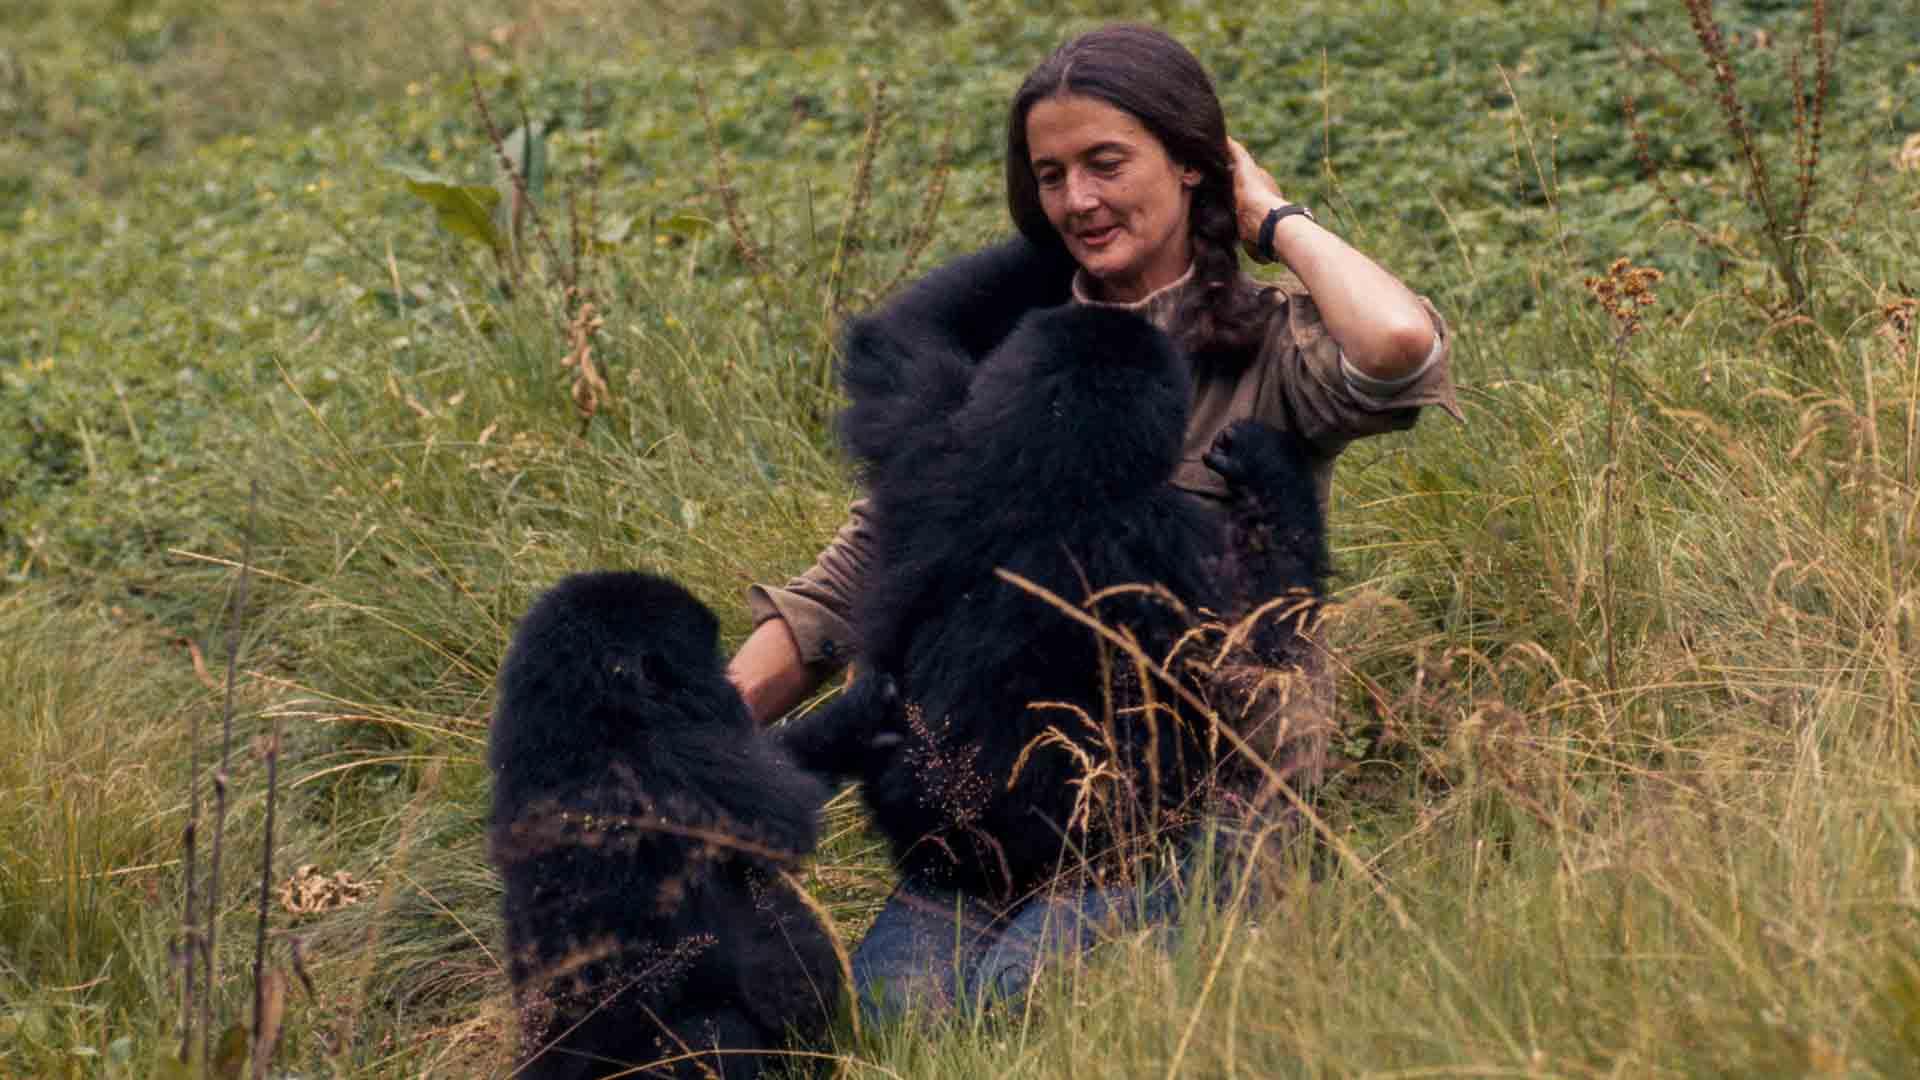 Dian Fossey ha dedicato la vita a proteggere i gorilla